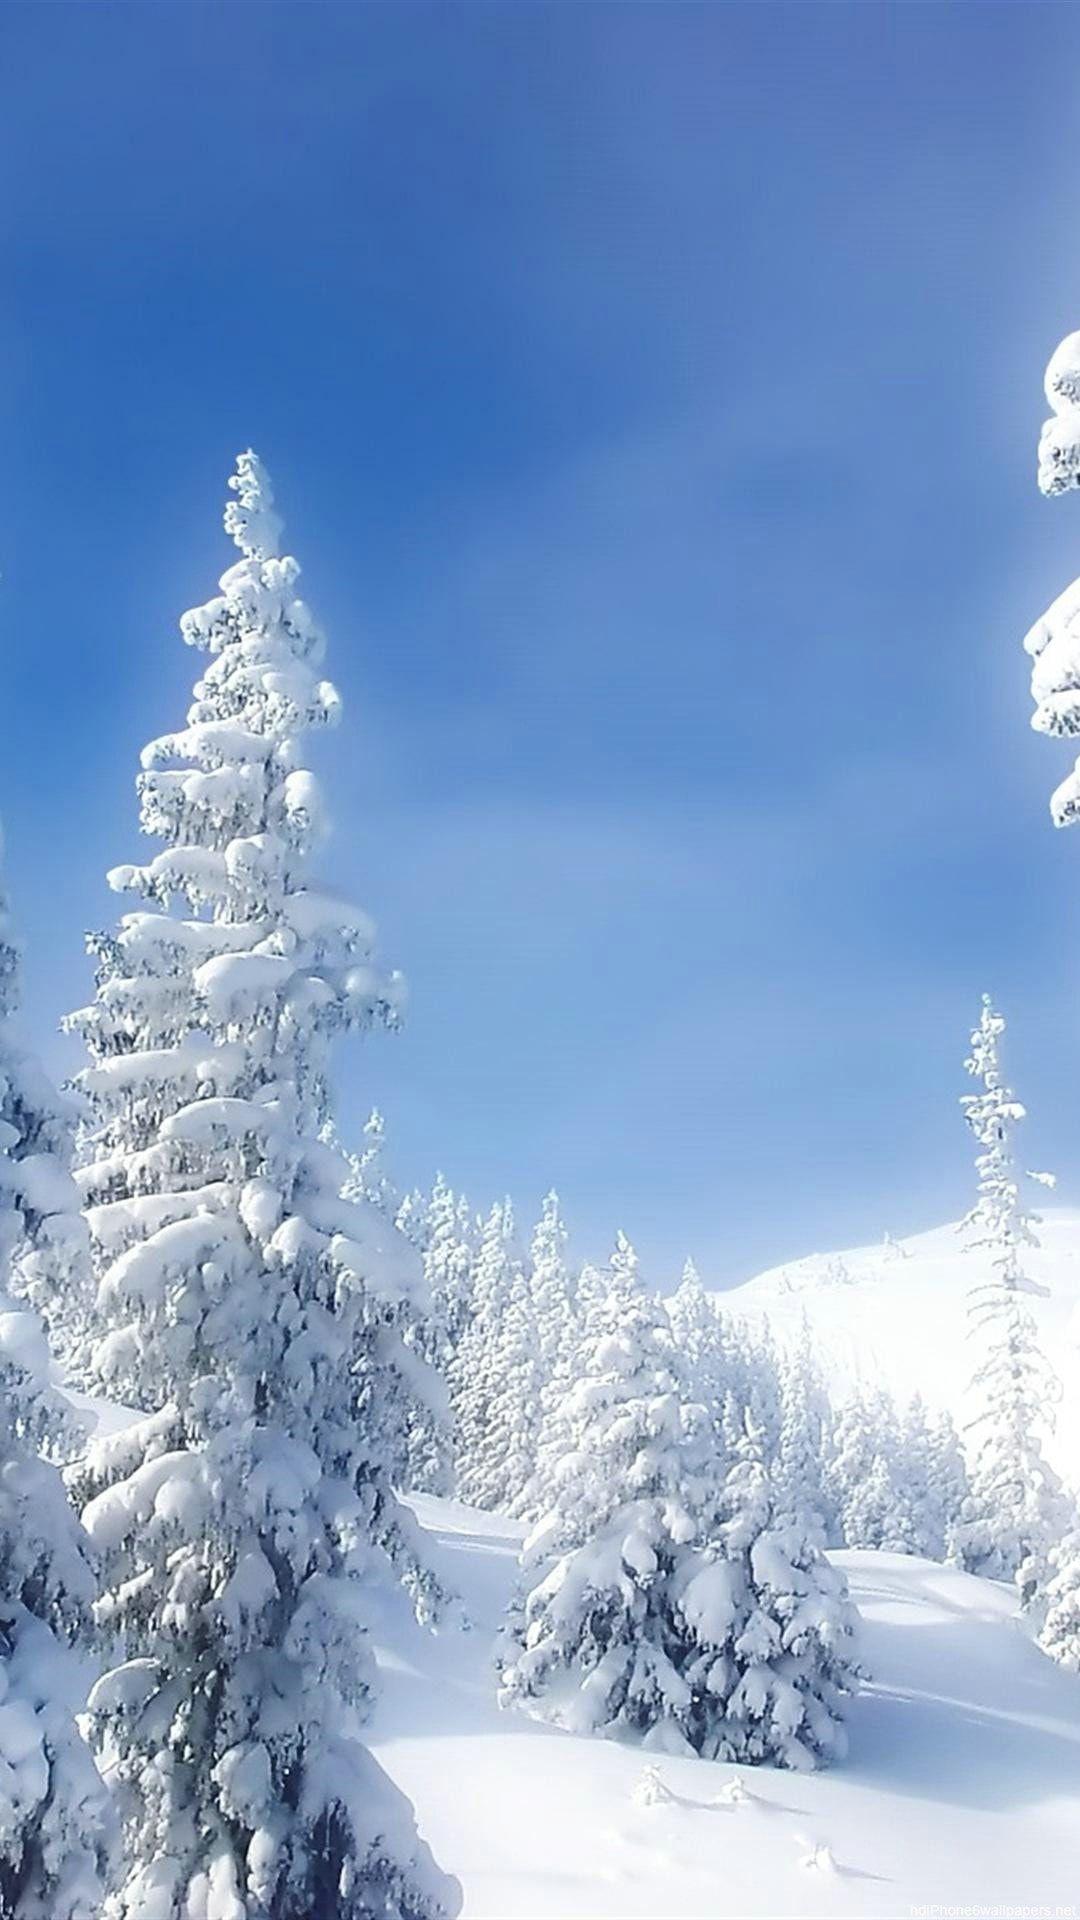 Pure White Snow Iphone Wallpaper Winter Snow Wallpaper Hd Winter Wallpaper